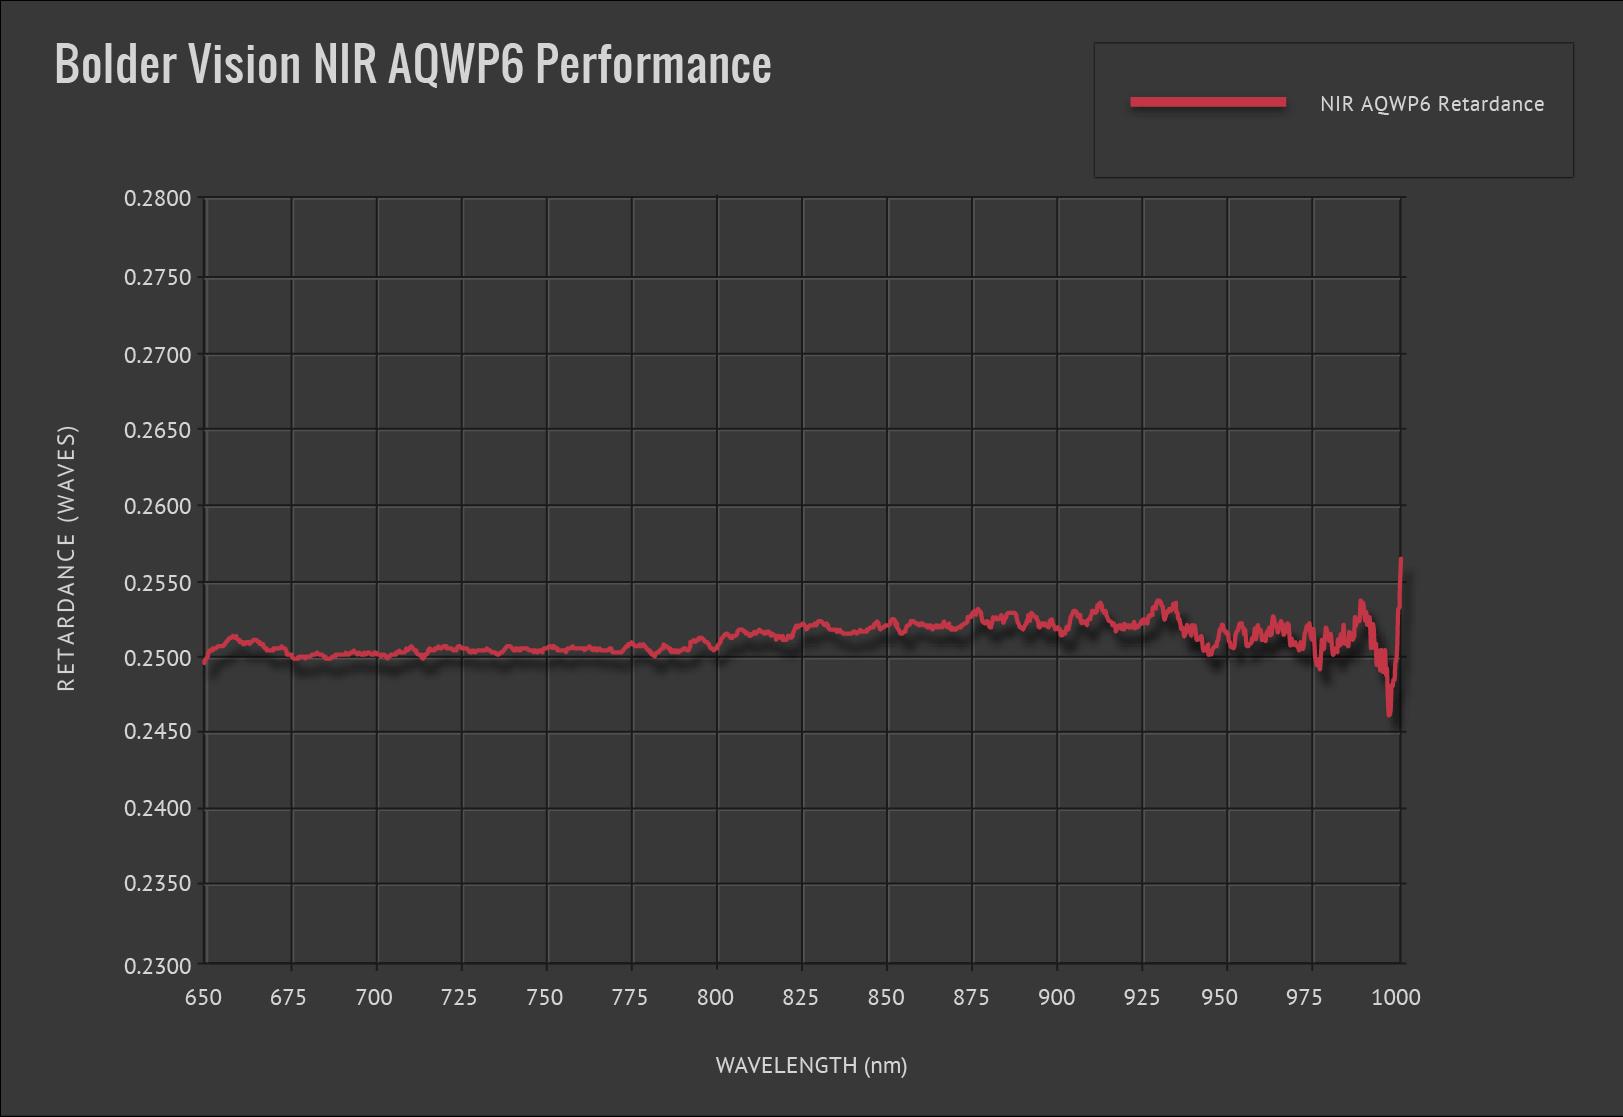 Bolder Vision Waveplate NIR AQWP6